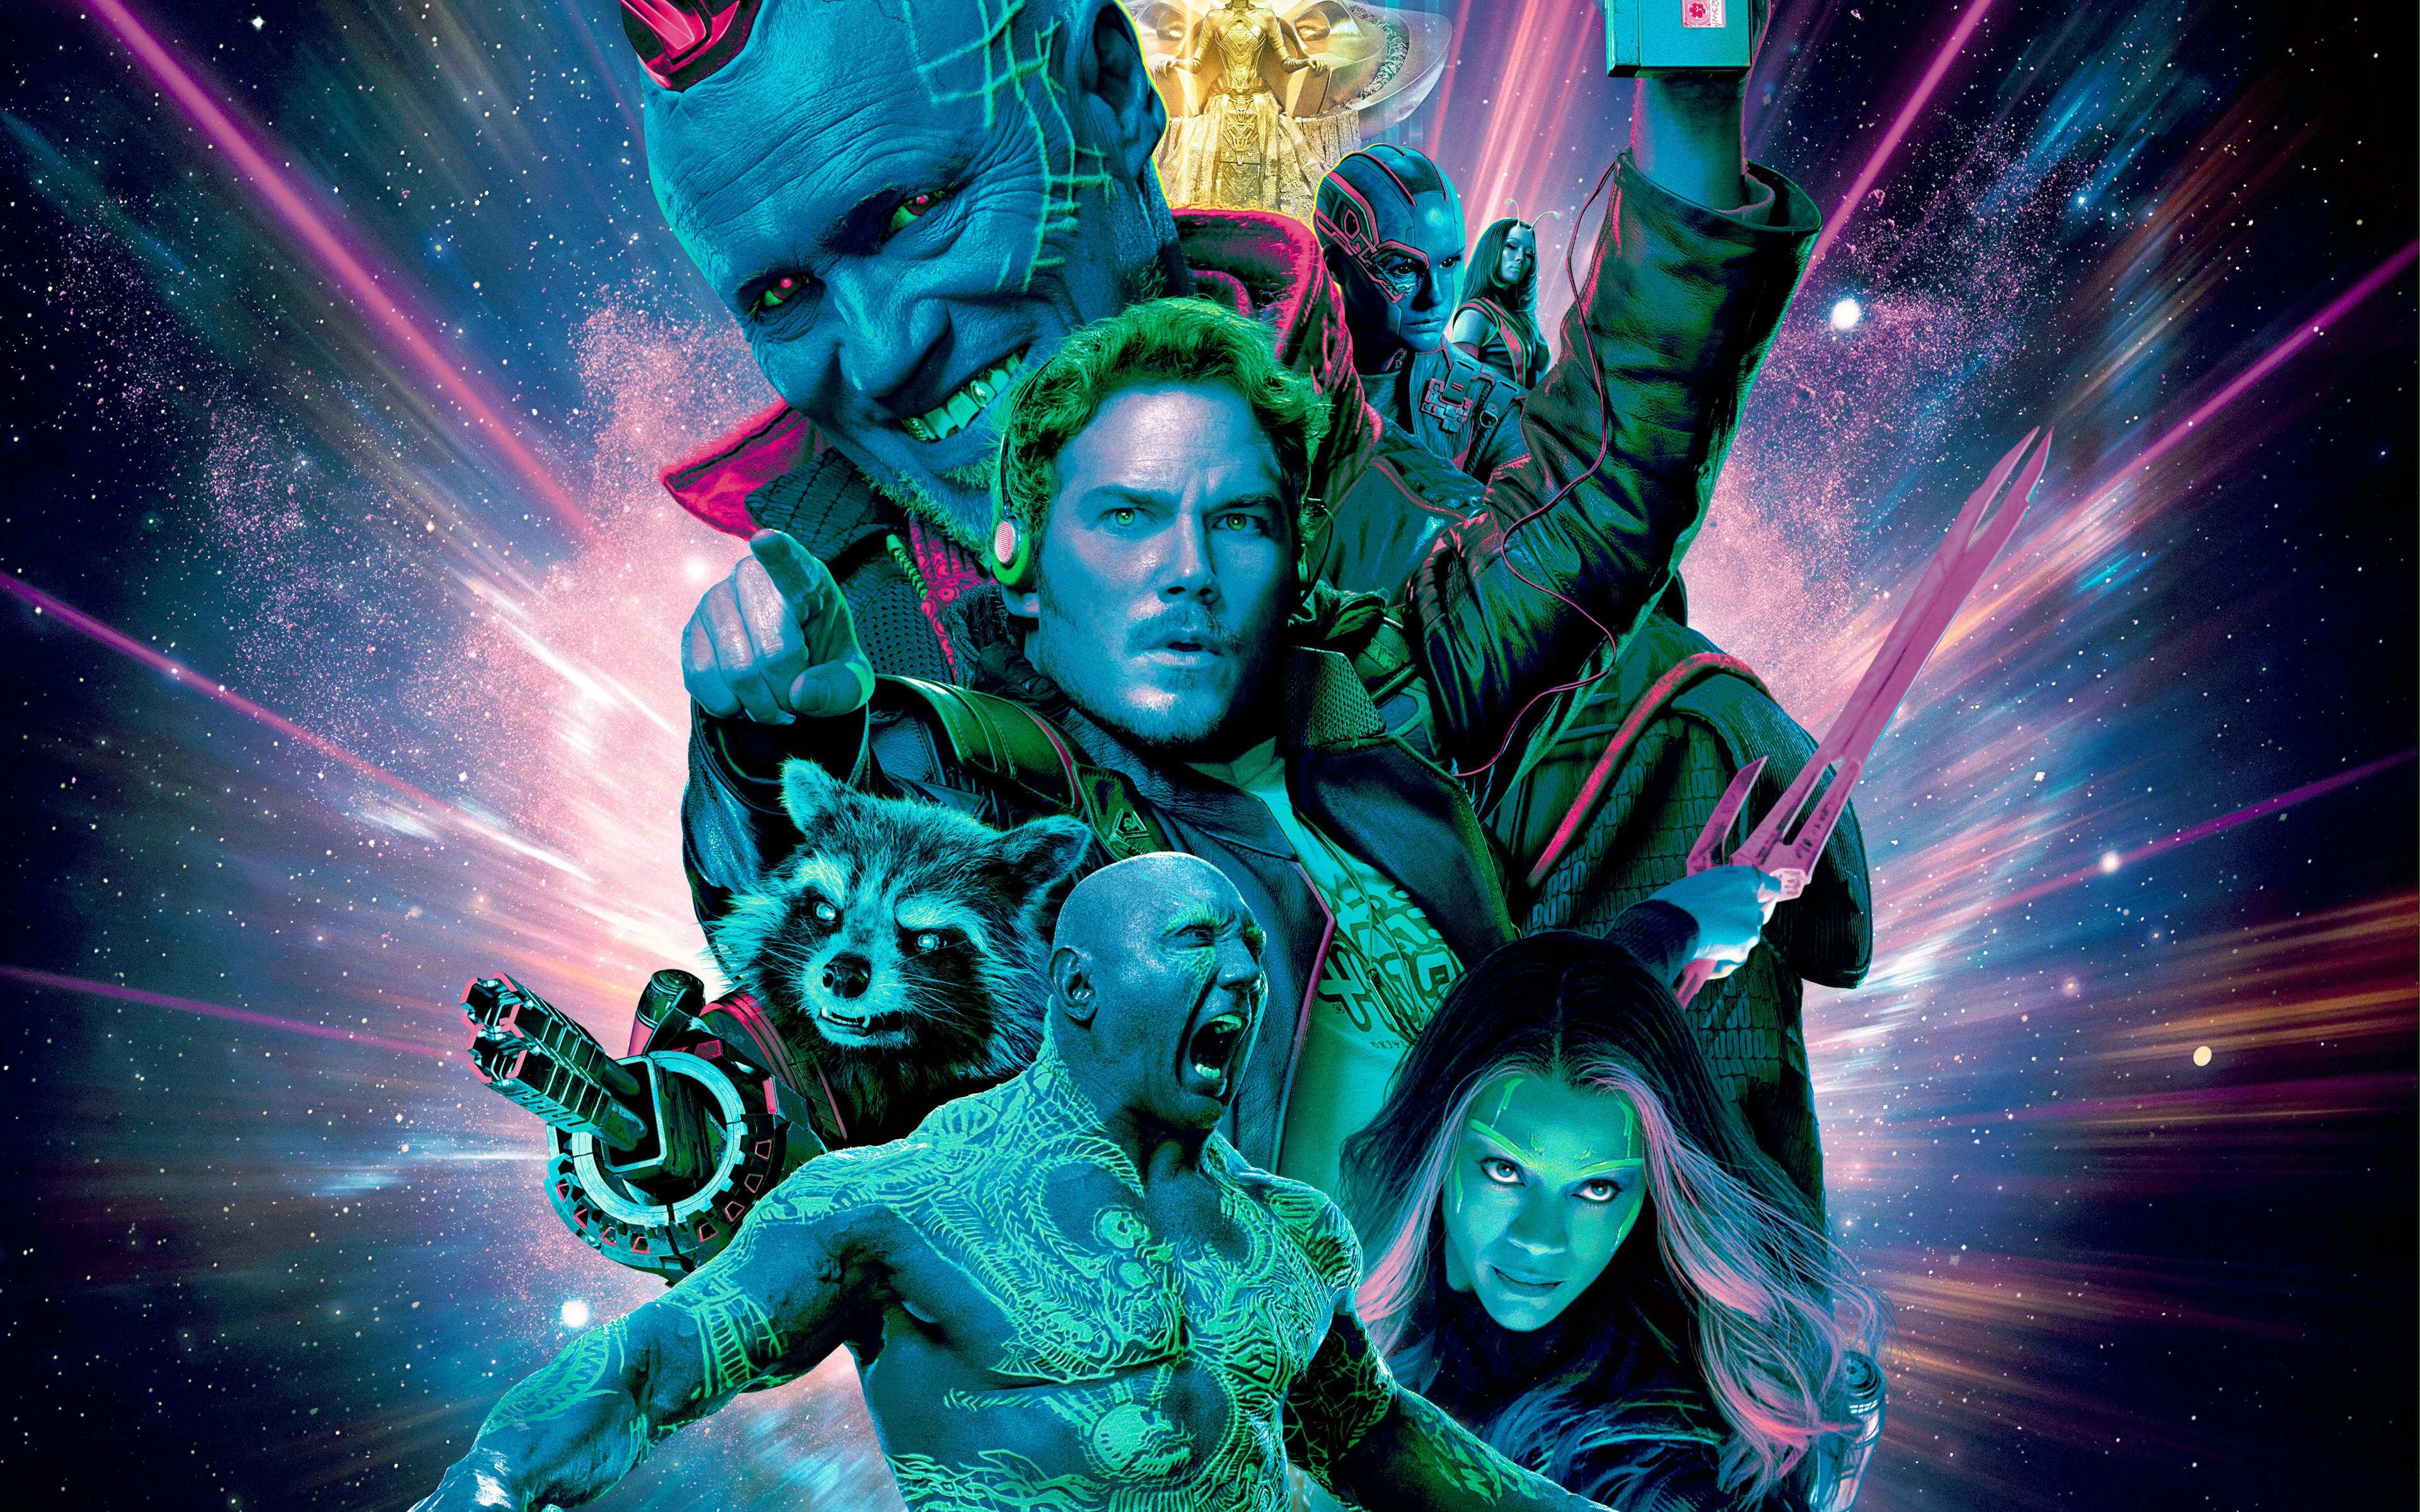 Free Download Imax Guardians Of The Galaxy Vol 2 4k New Hd